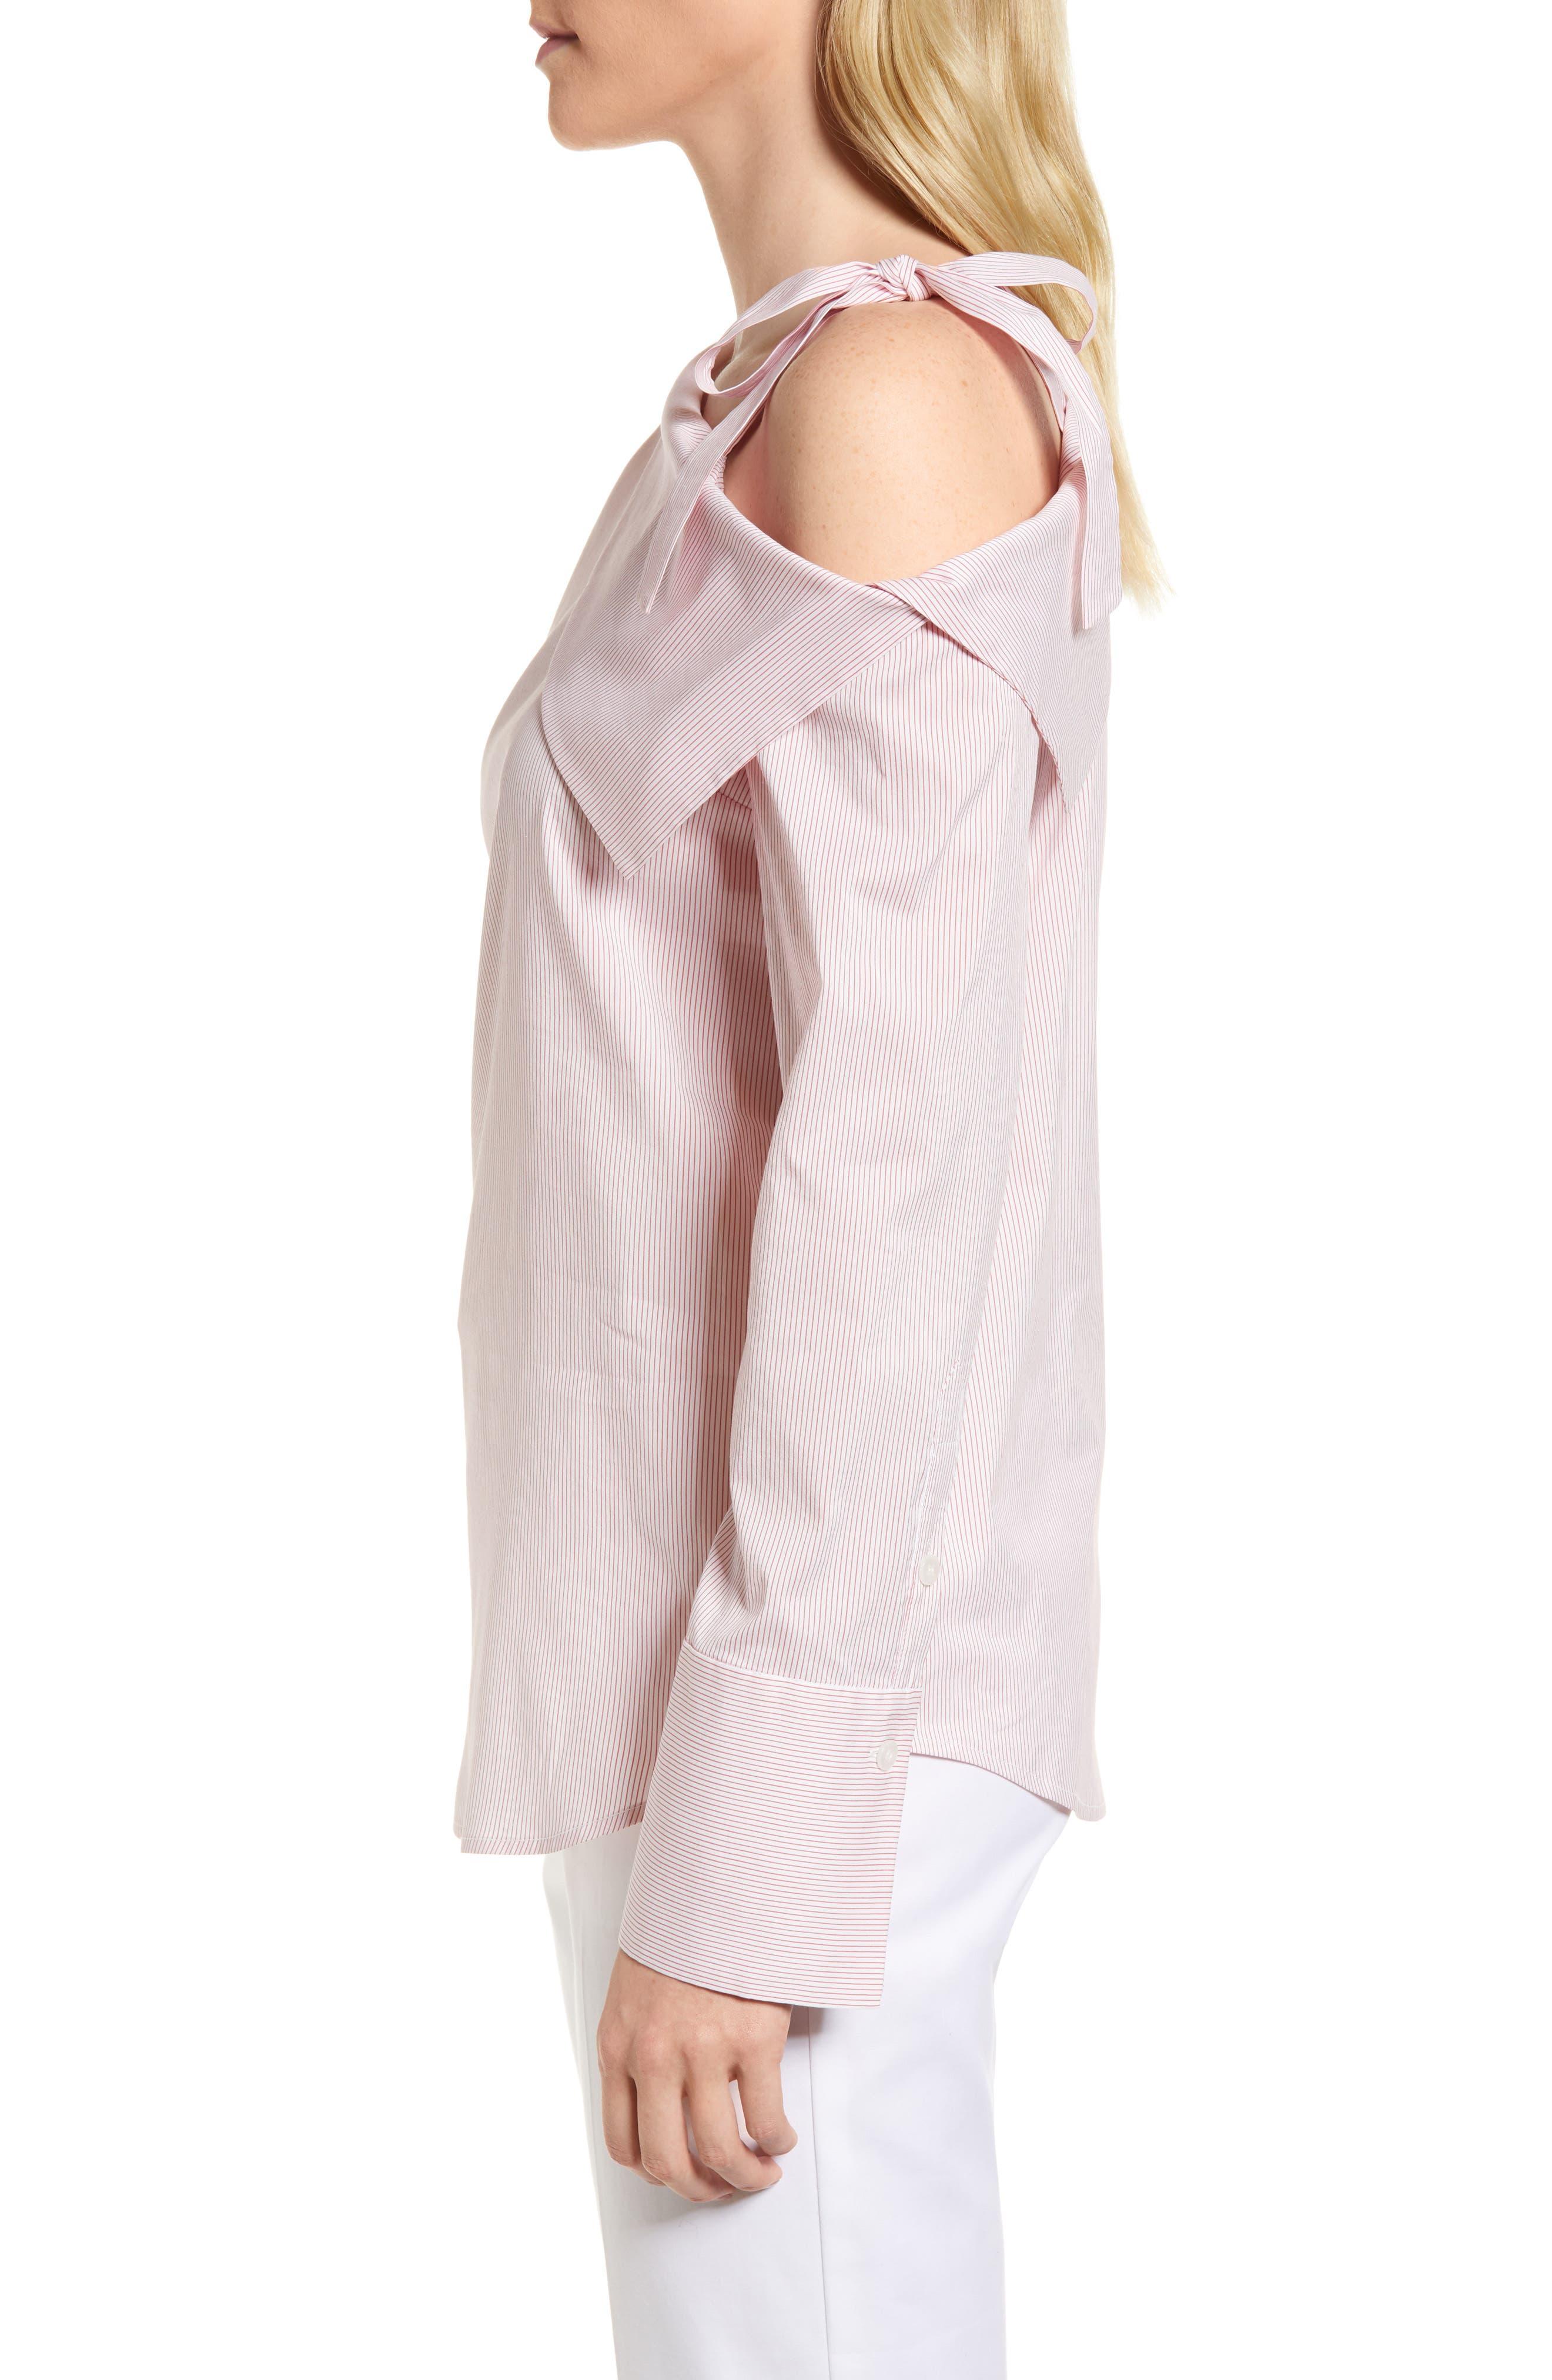 One-Shoulder Shirt,                             Alternate thumbnail 3, color,                             Pink Honey Chic Stripe